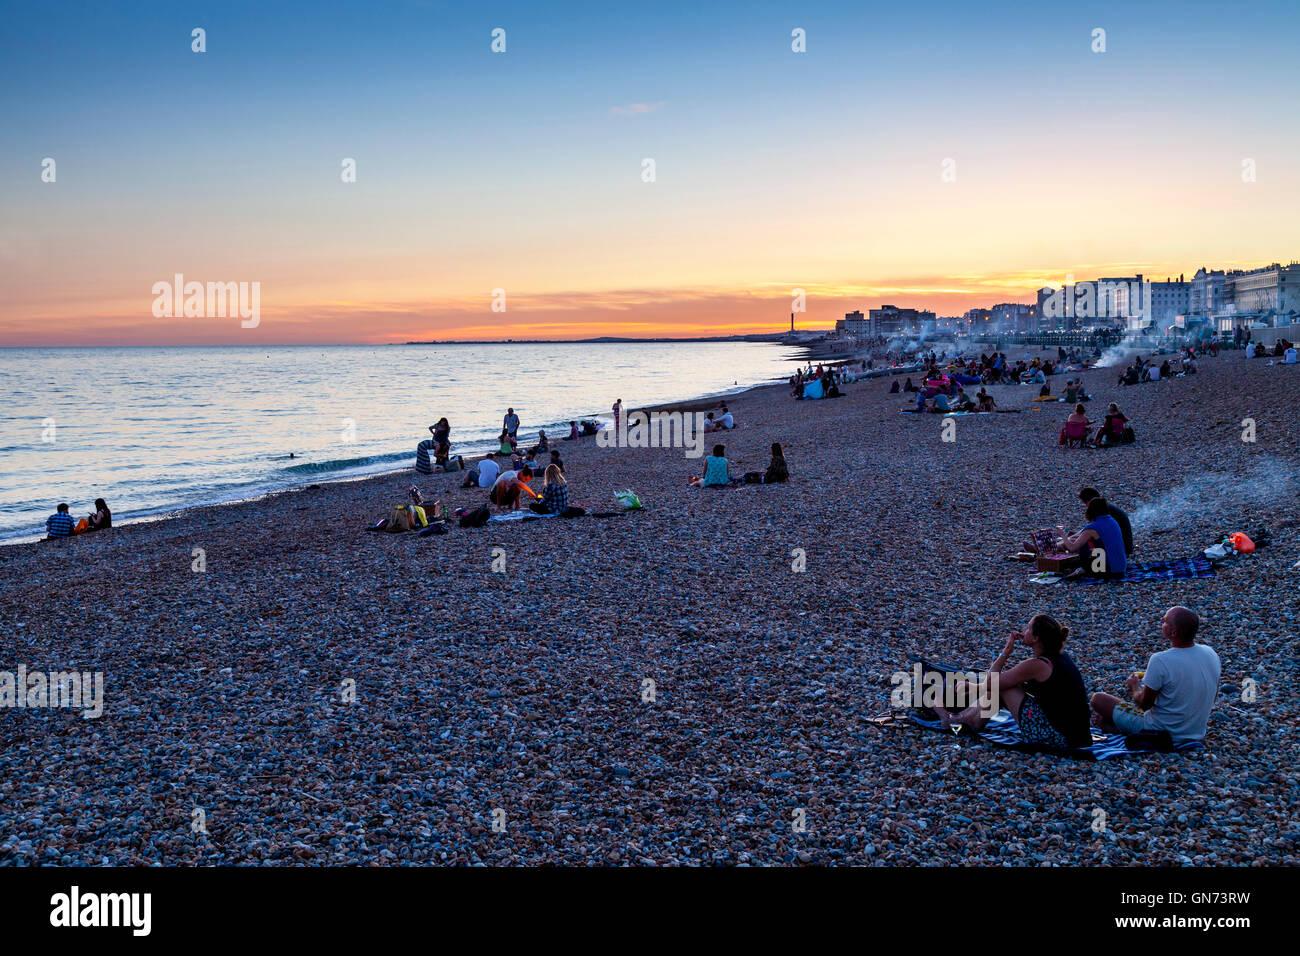 People Sitting On Brighton Beach At Sunset, Brighton, Sussex, UK - Stock Image